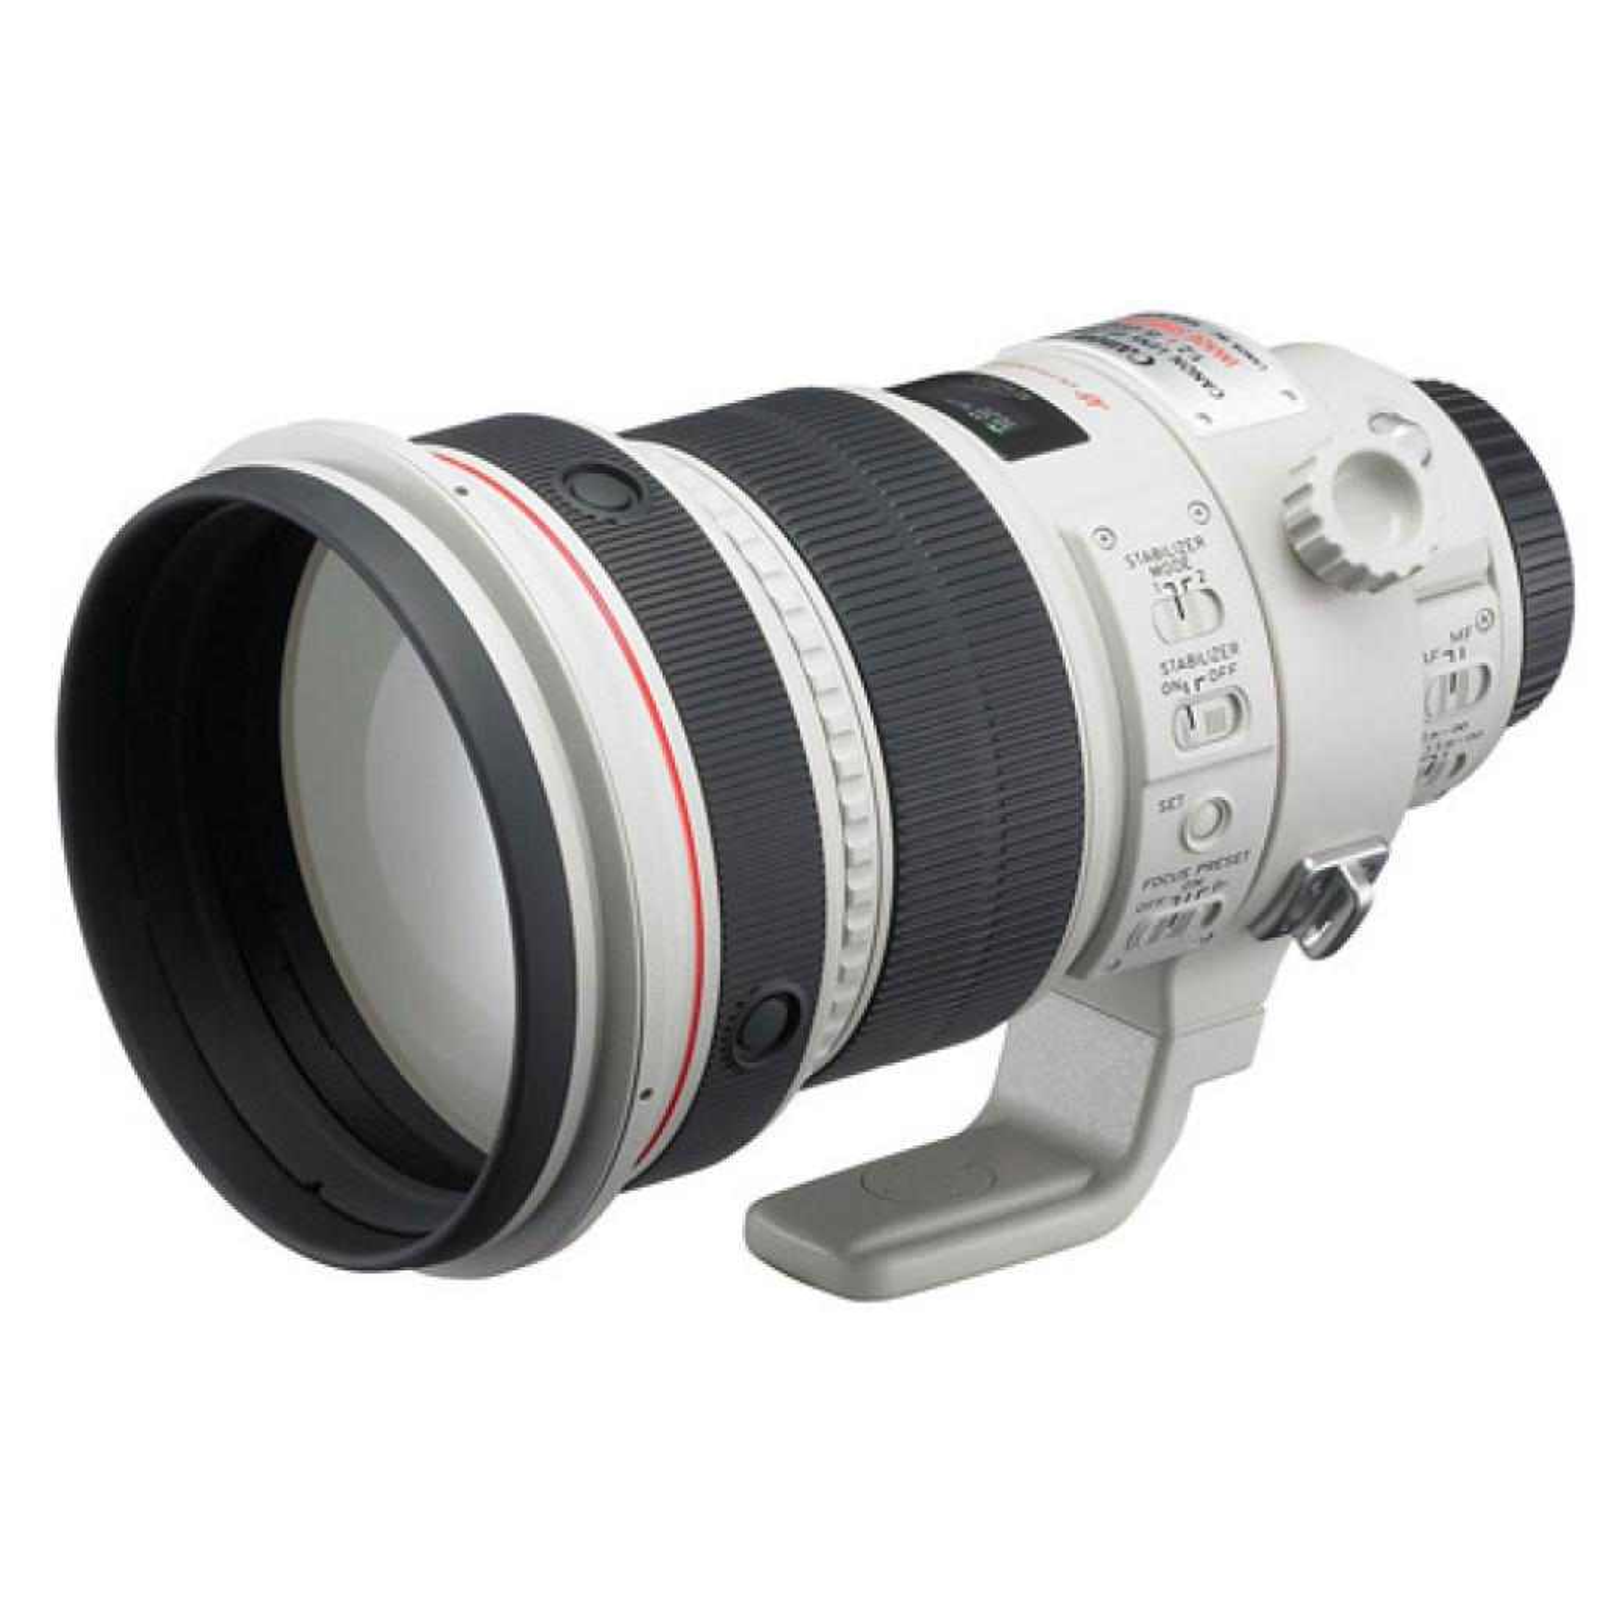 Объектив Canon EF 200mm f/2.0L IS USM (2297B005)